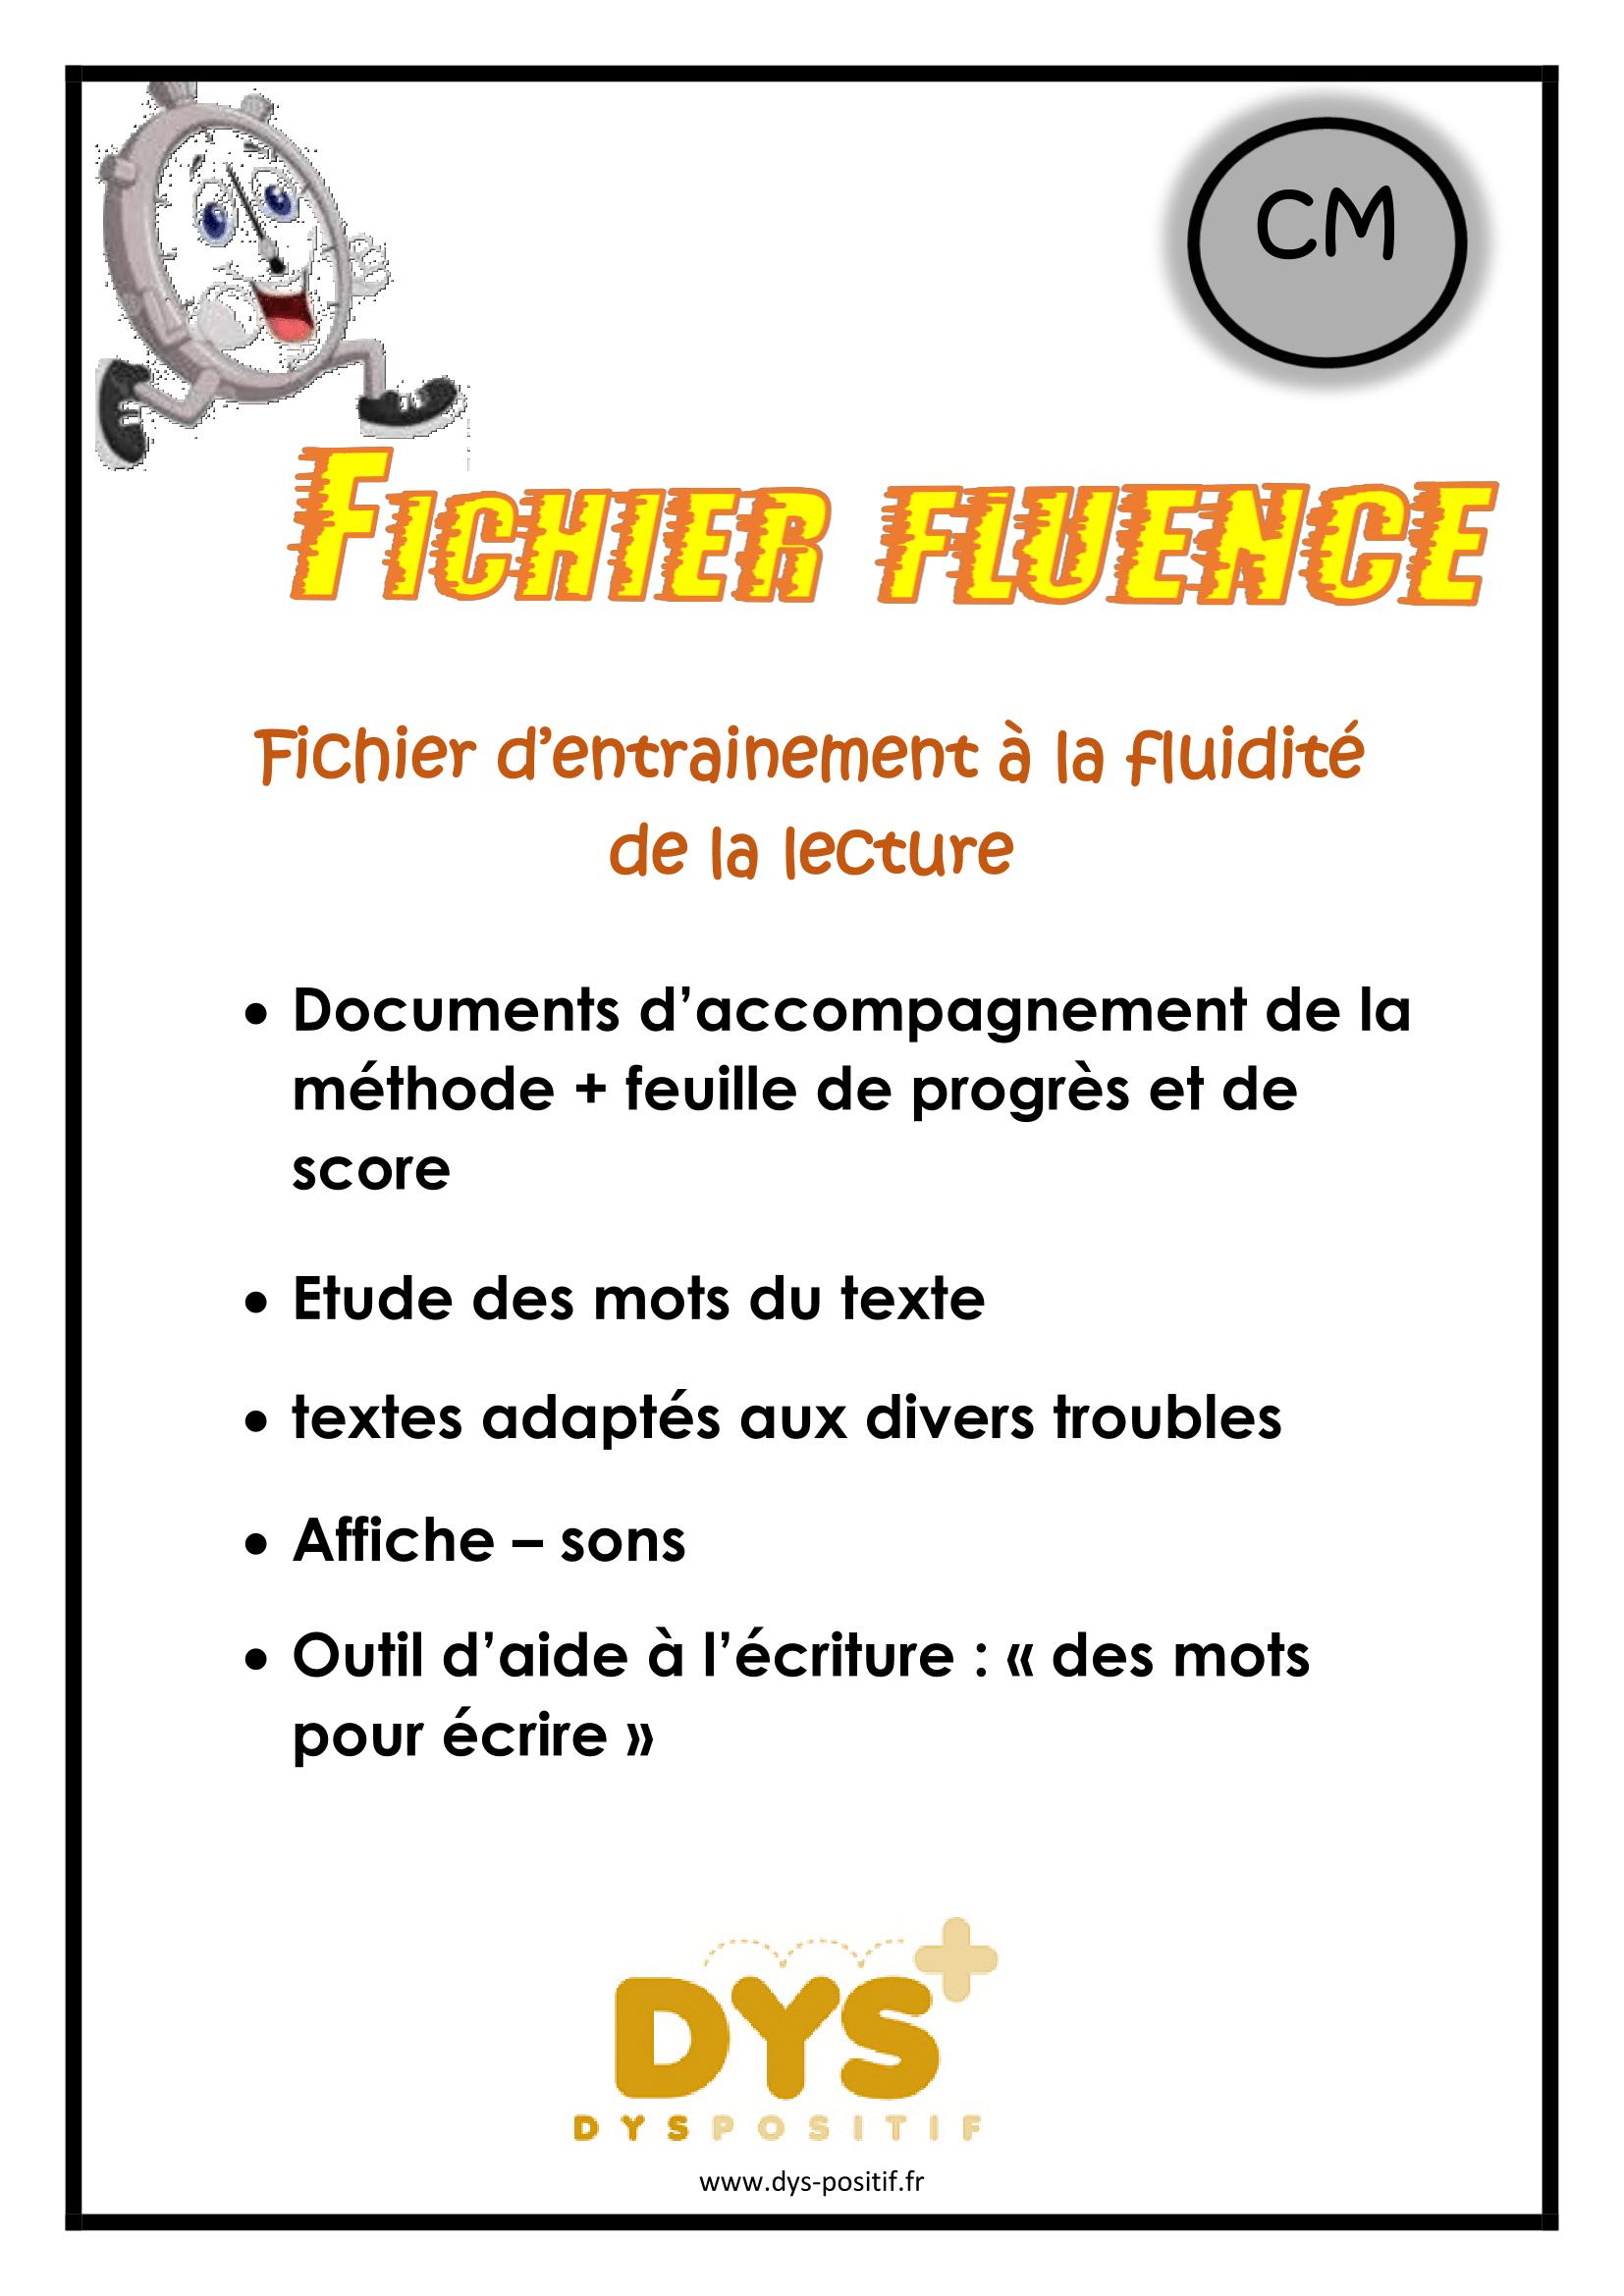 Lecture fluence CM2